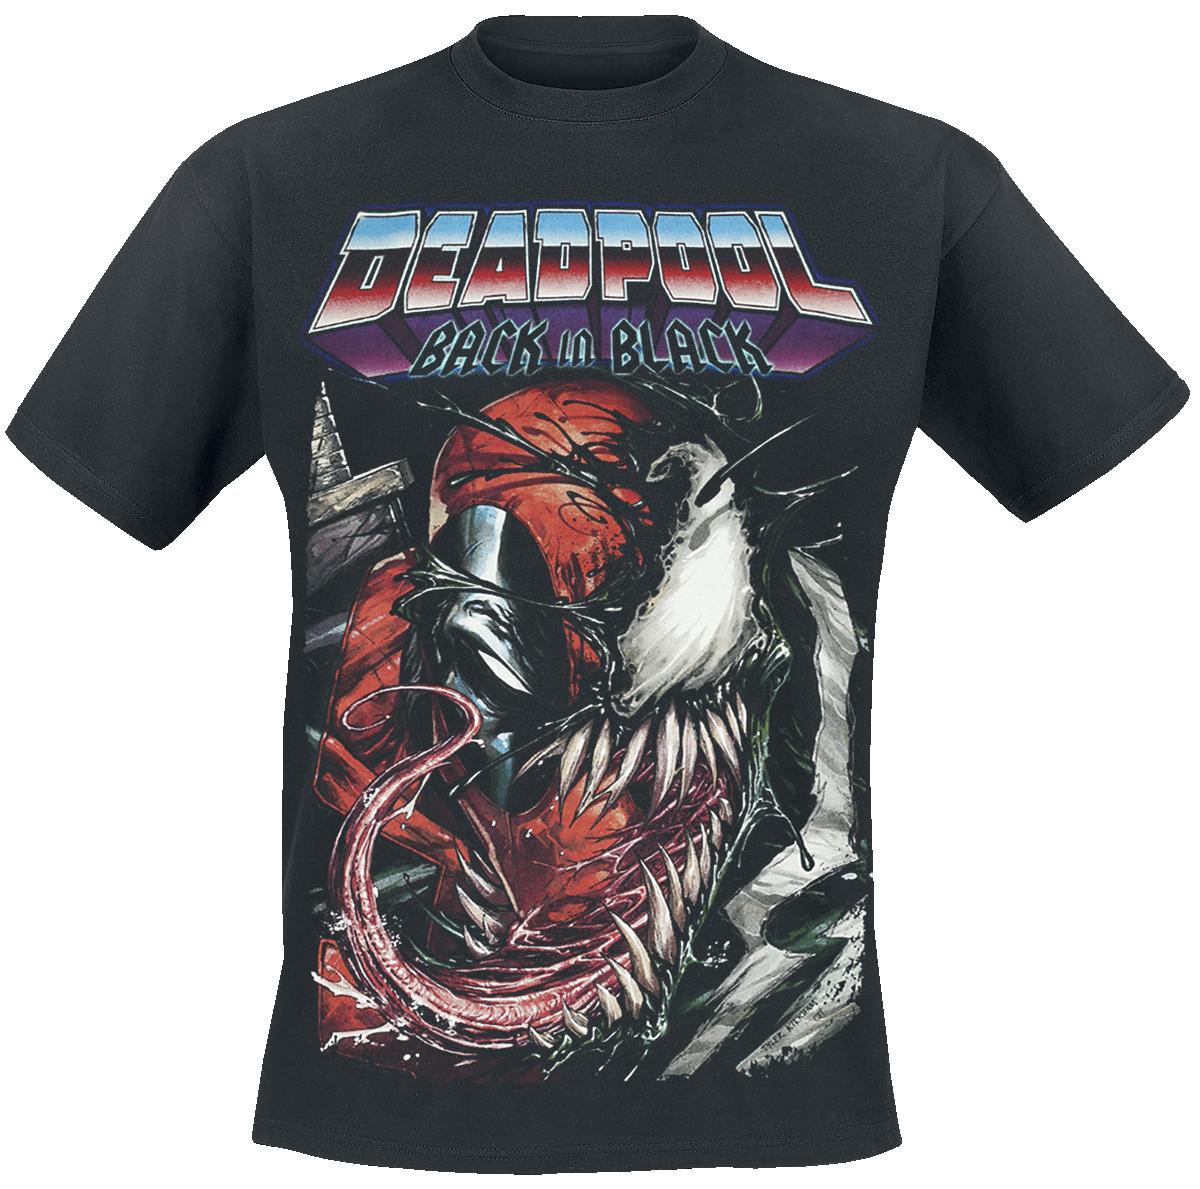 Deadpool - Back In Black - T-Shirt - black image